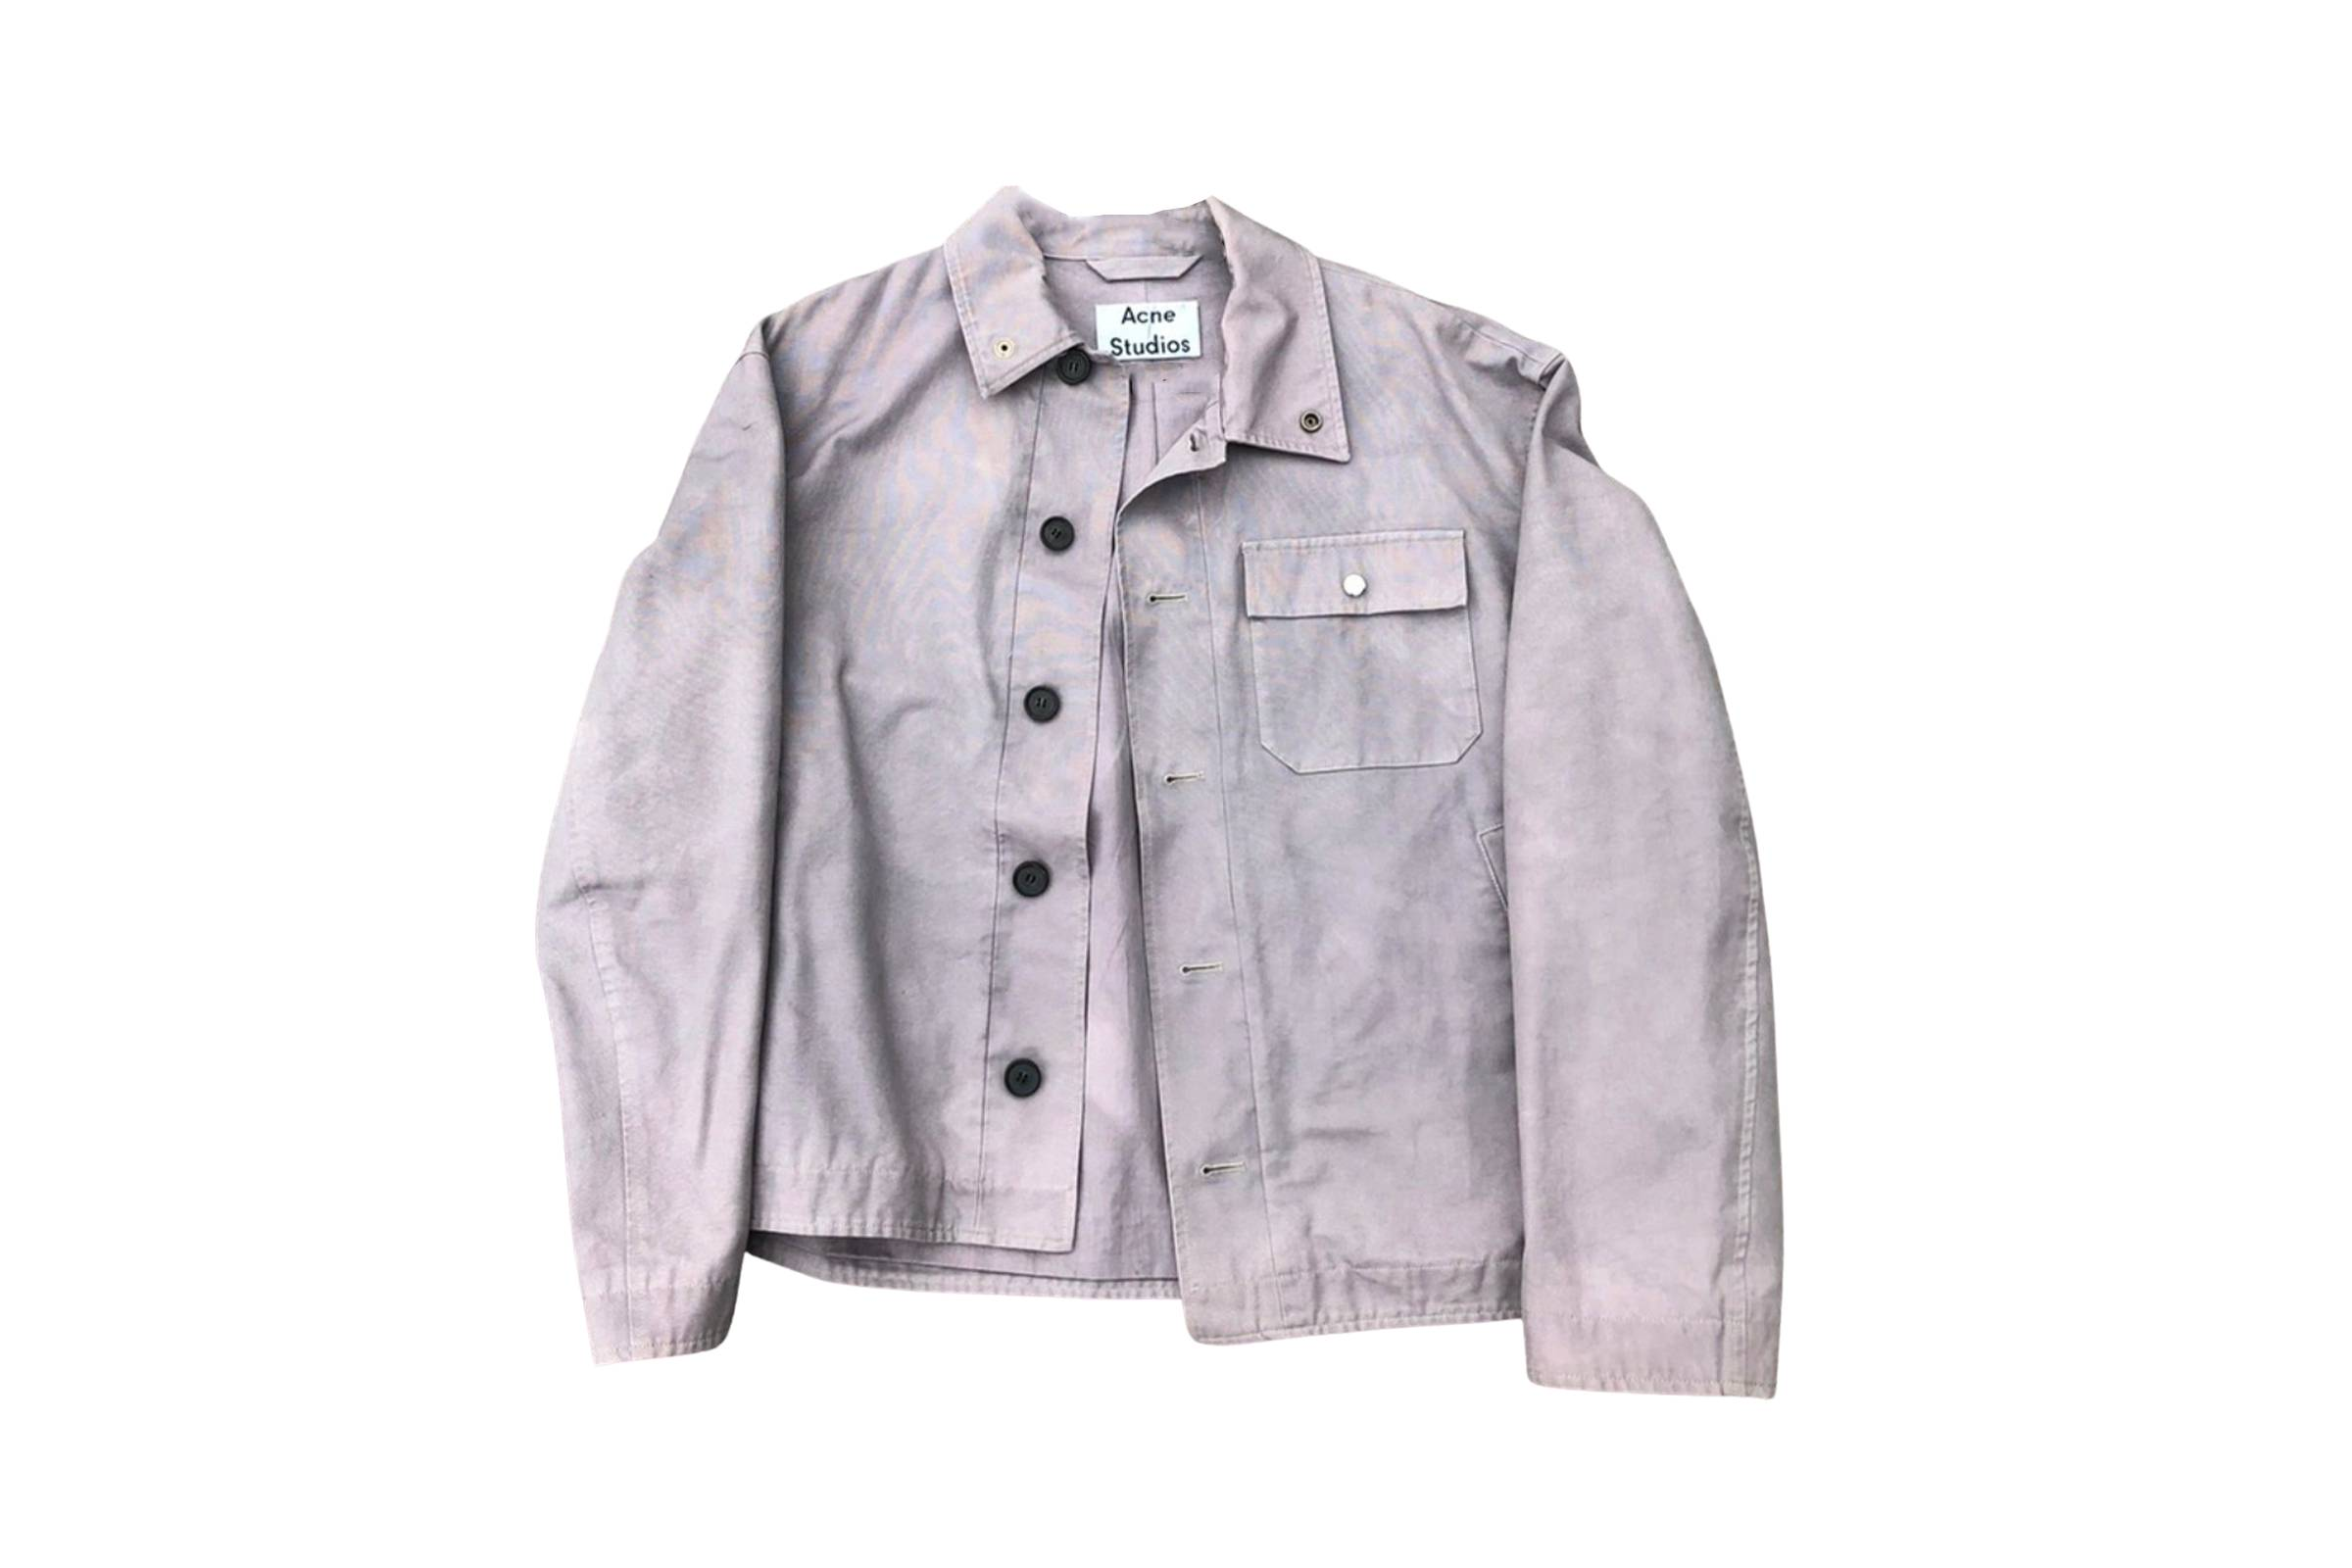 Acne Studios Workwear-Inspired Jacket